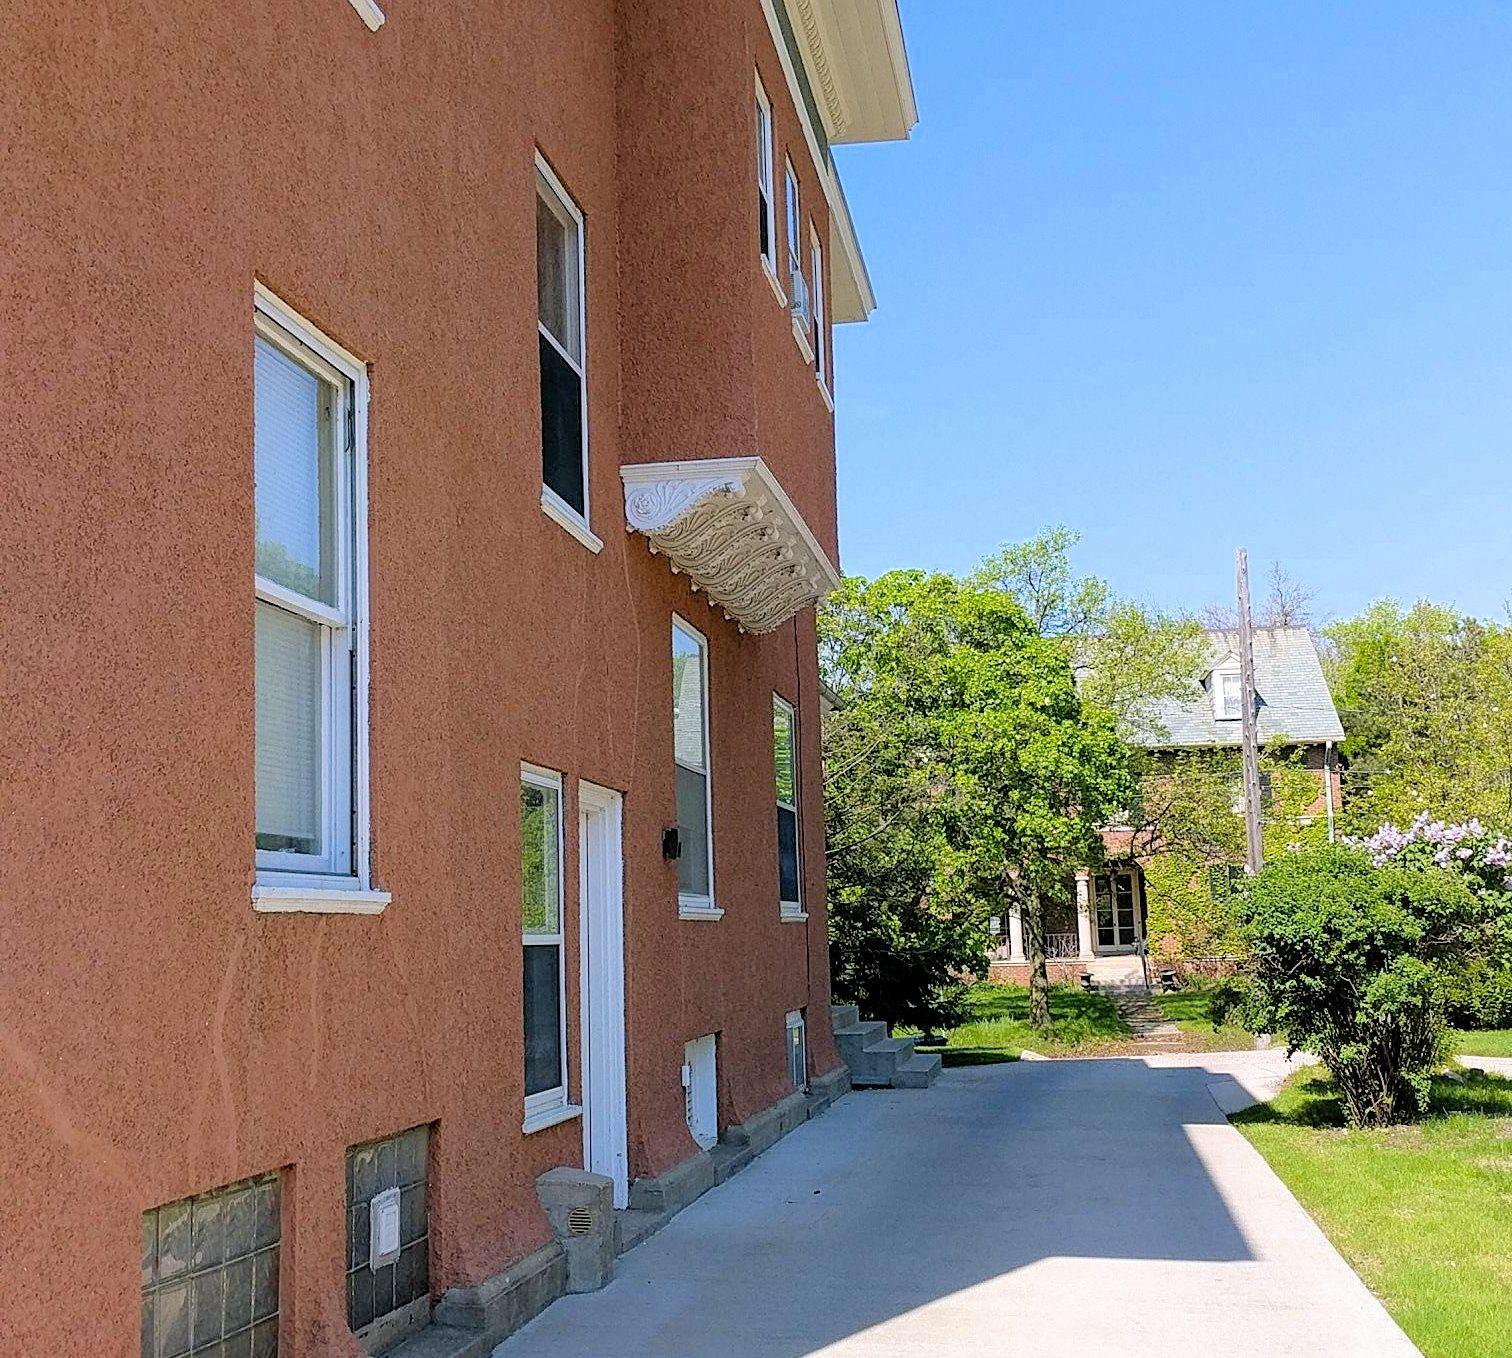 40 Prospect Apartments   Apartments in Grand Rapids, MI